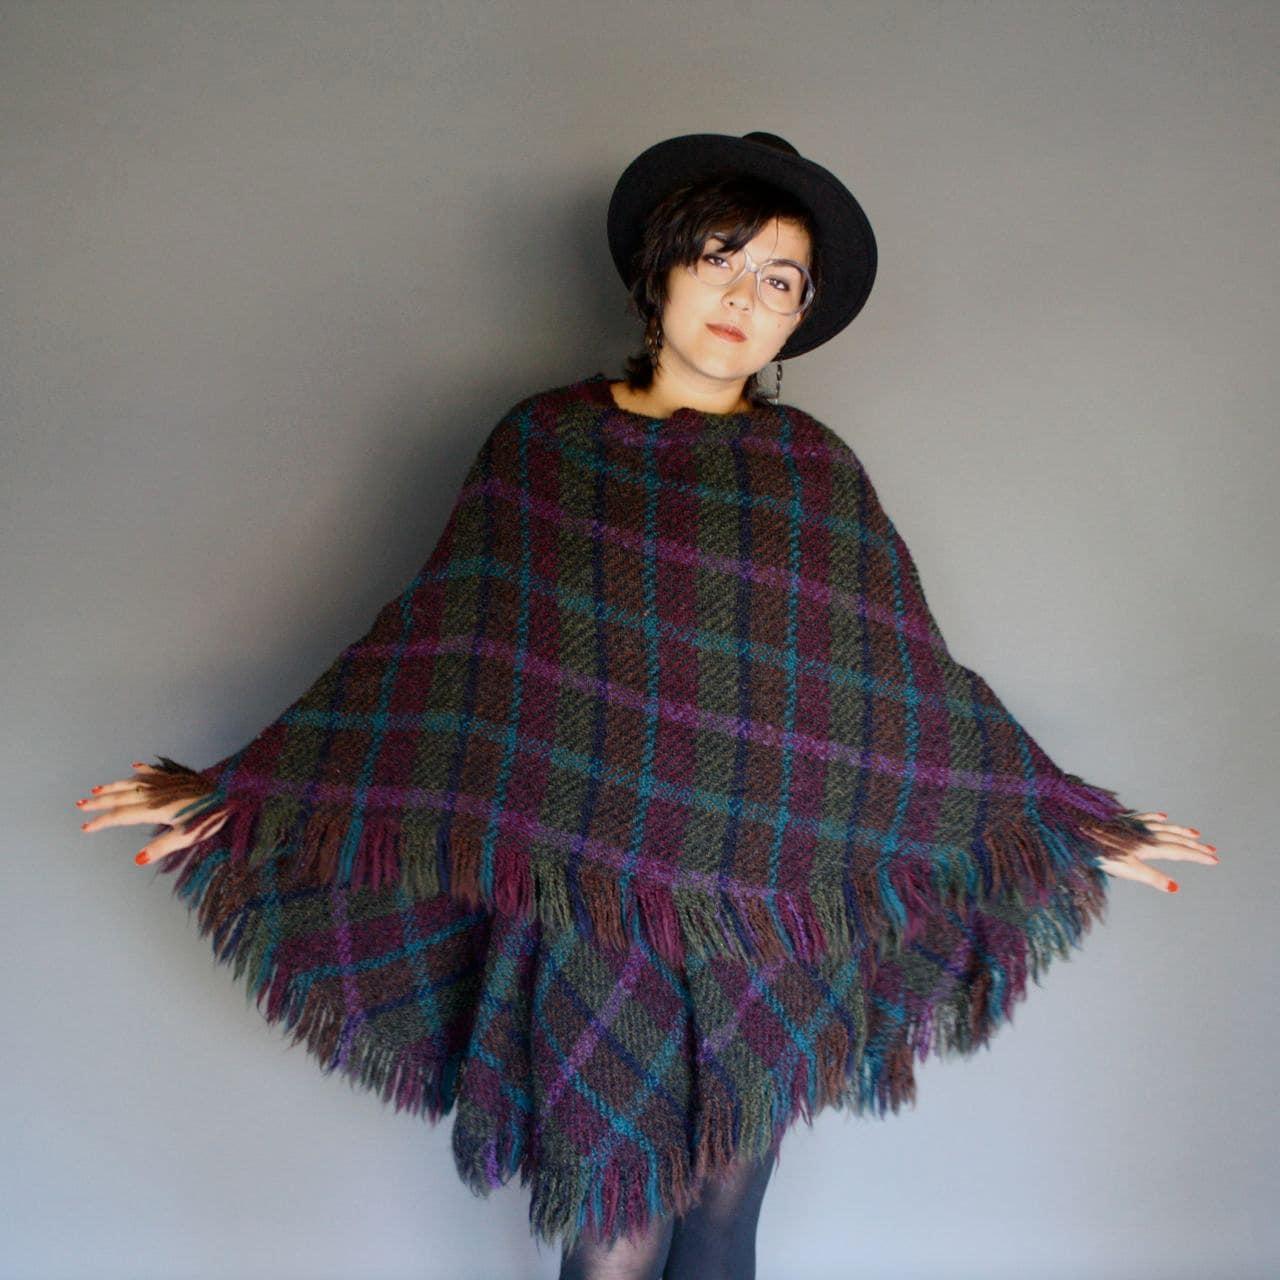 Wool Cape Knitting Pattern : irish wool cape . knitted wool poncho . winter jewel tones